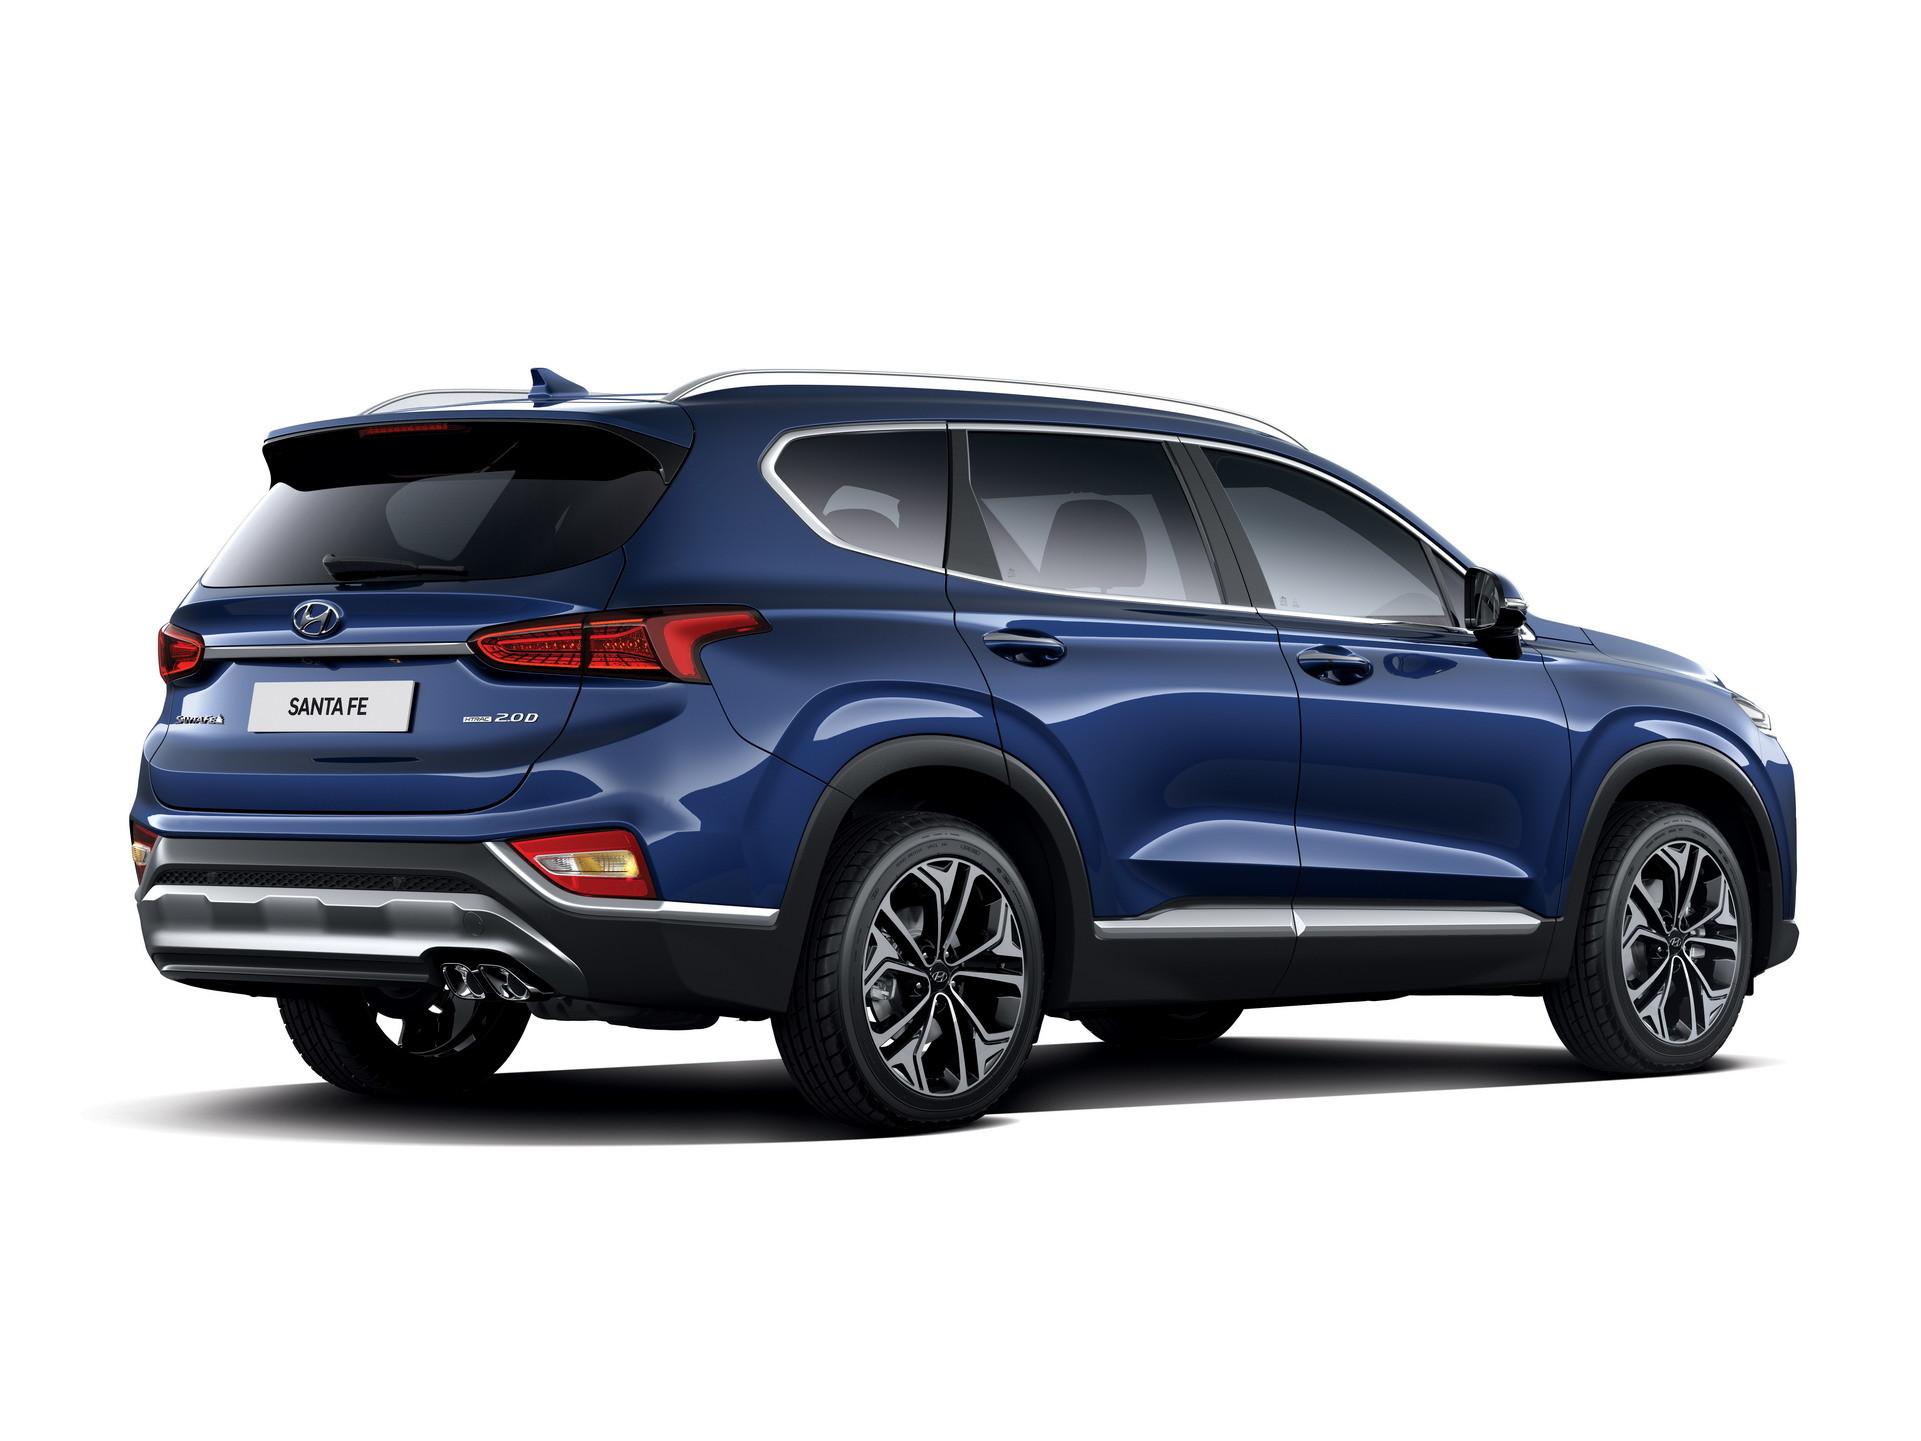 Foto de Hyundai Santa Fe 2019 (23/50)